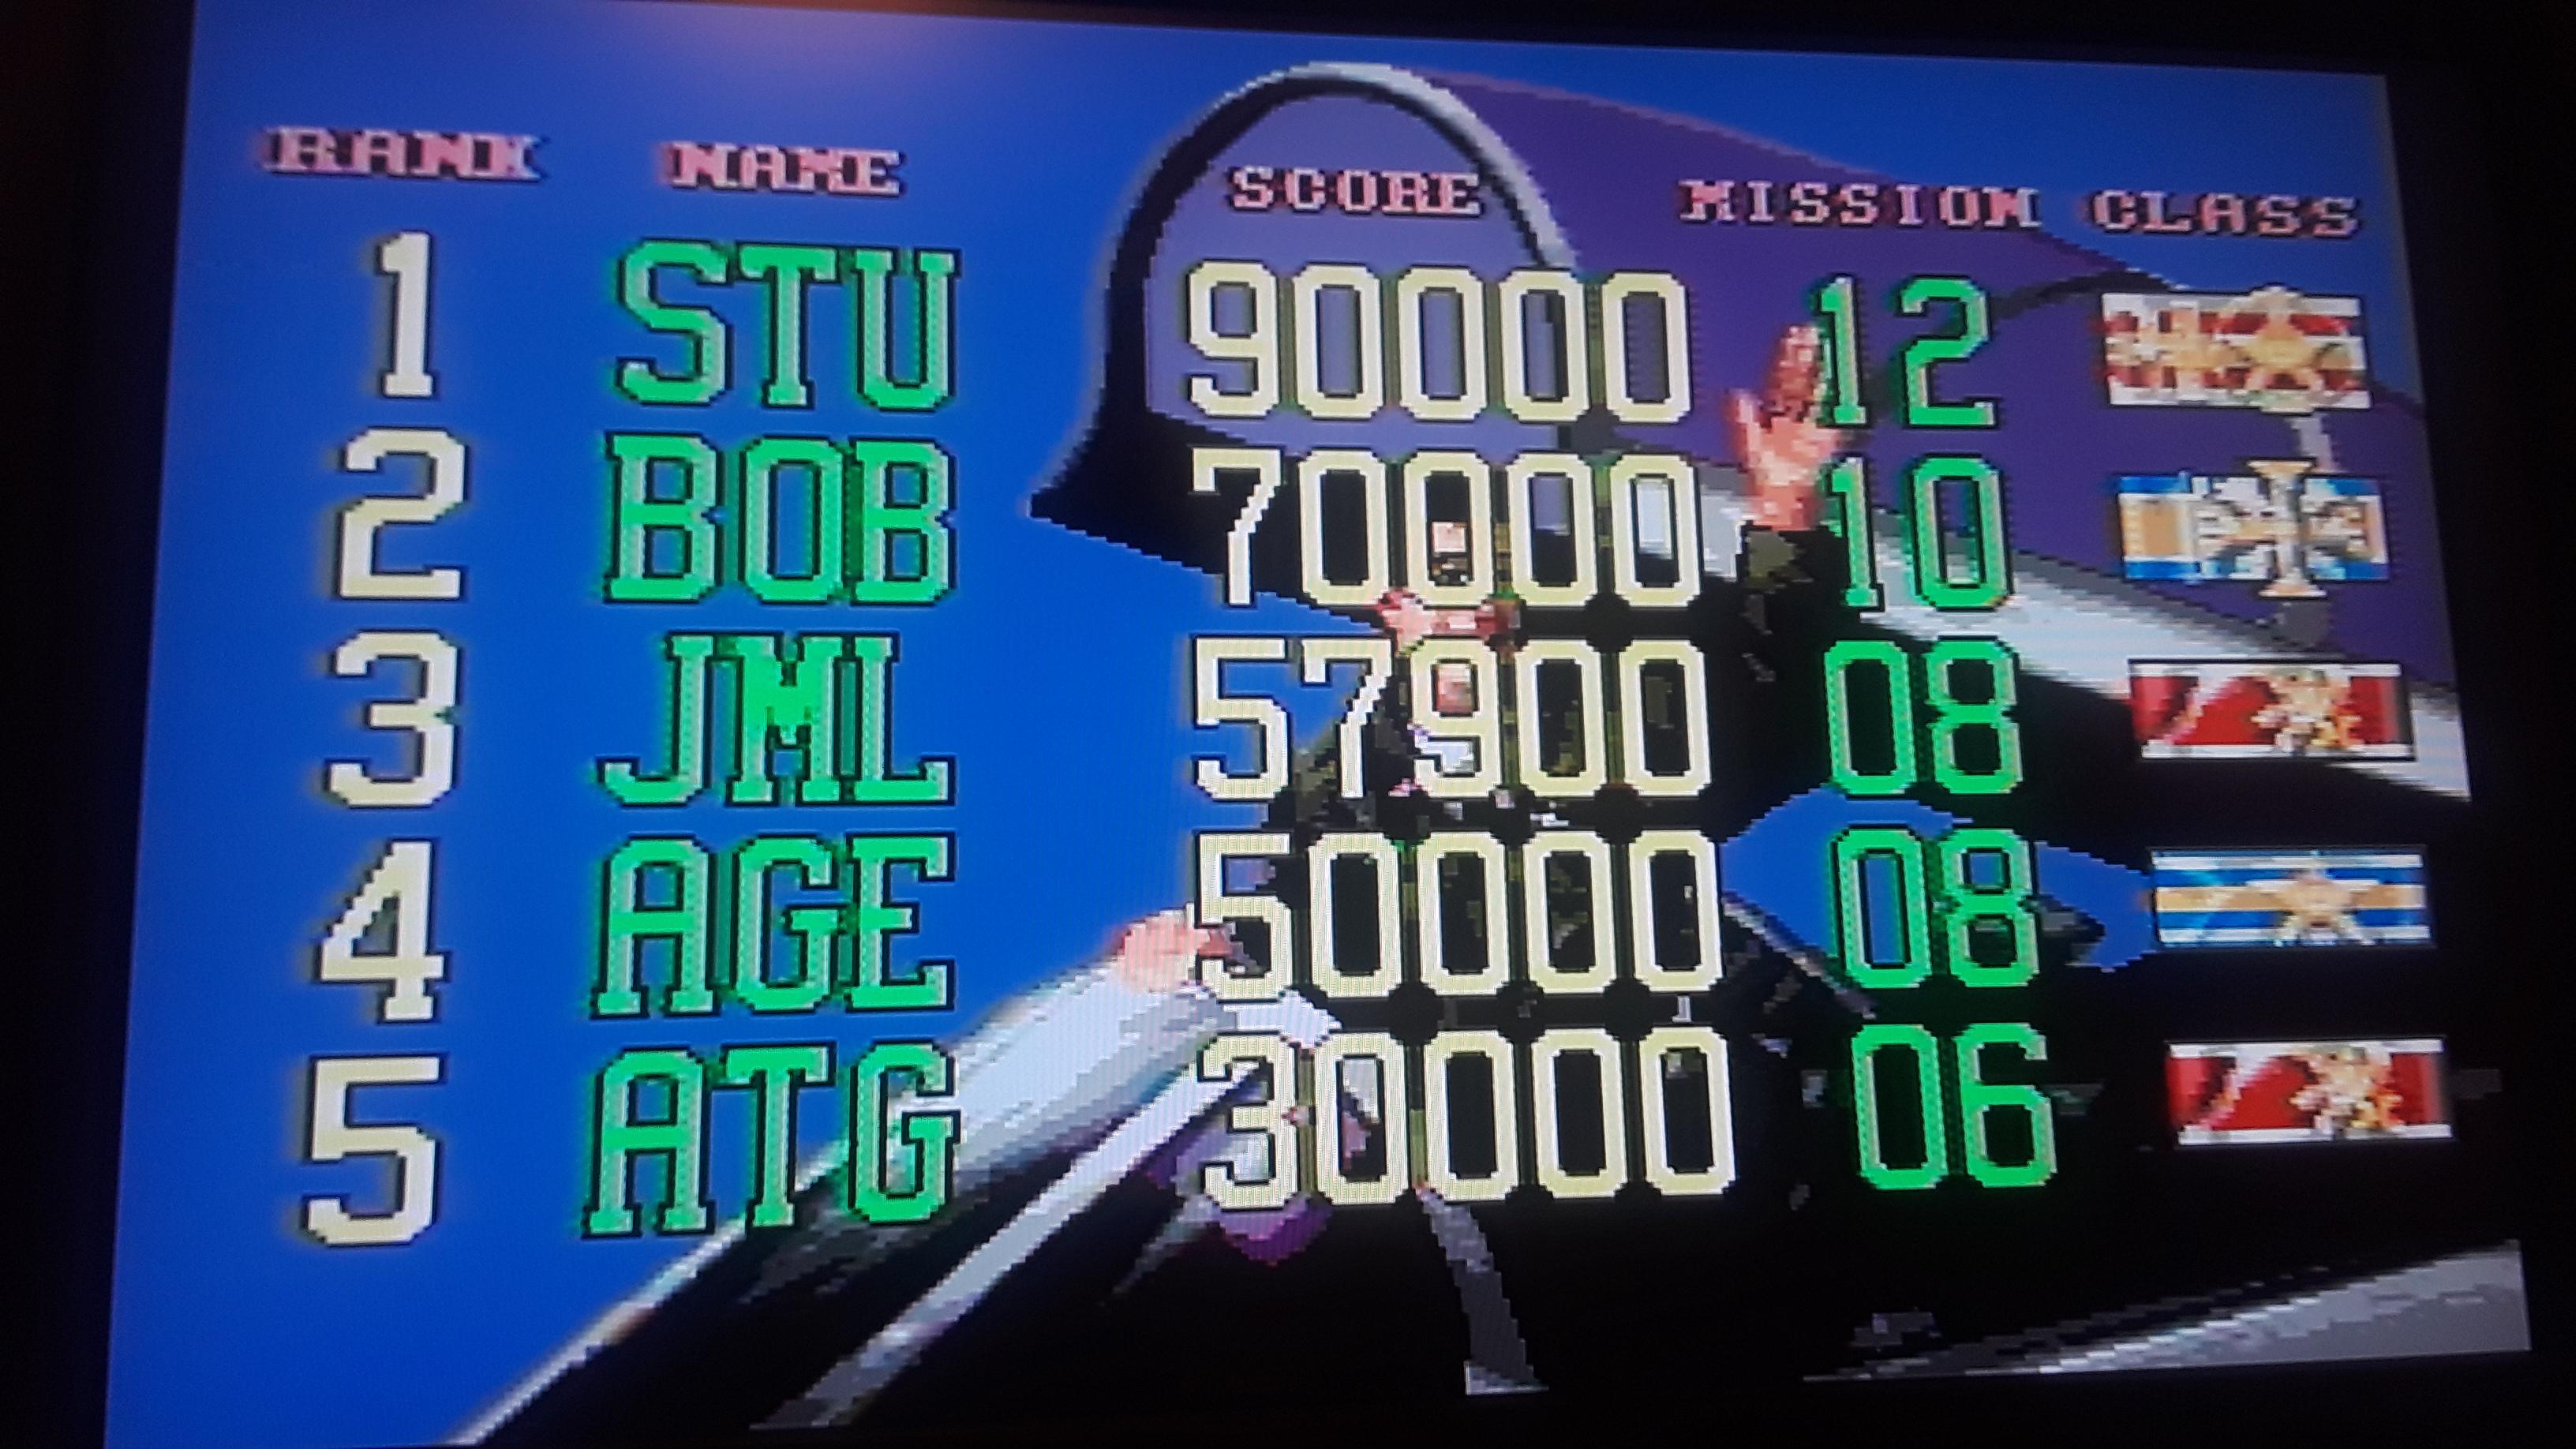 G-LOC: Air Battle [Easy] 57,900 points